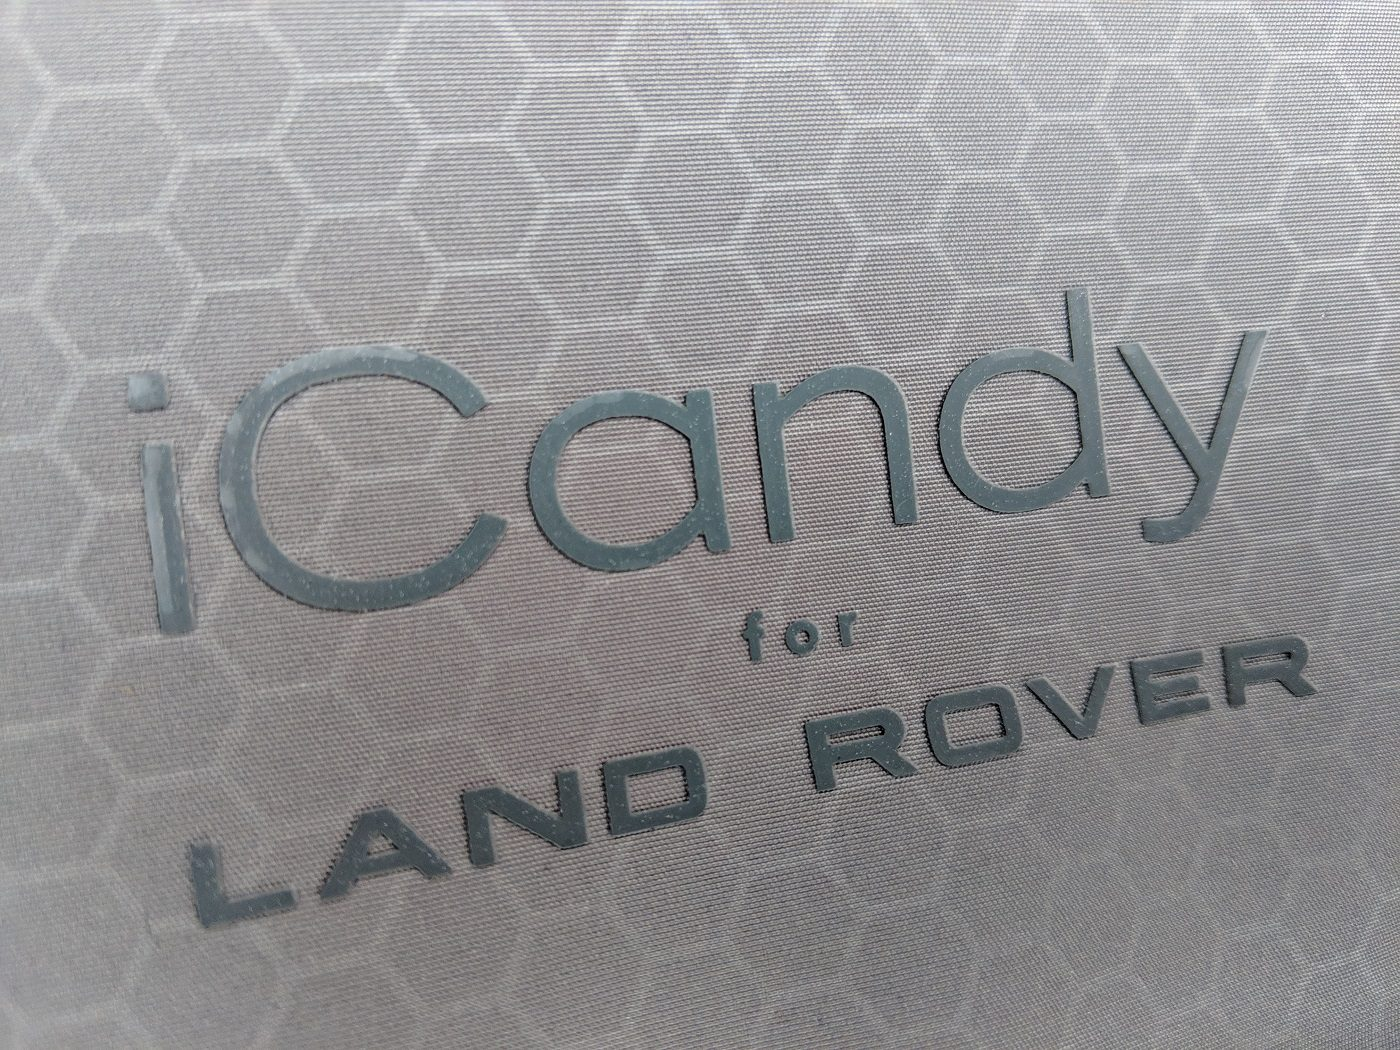 iCandy Peach Land Rover 1